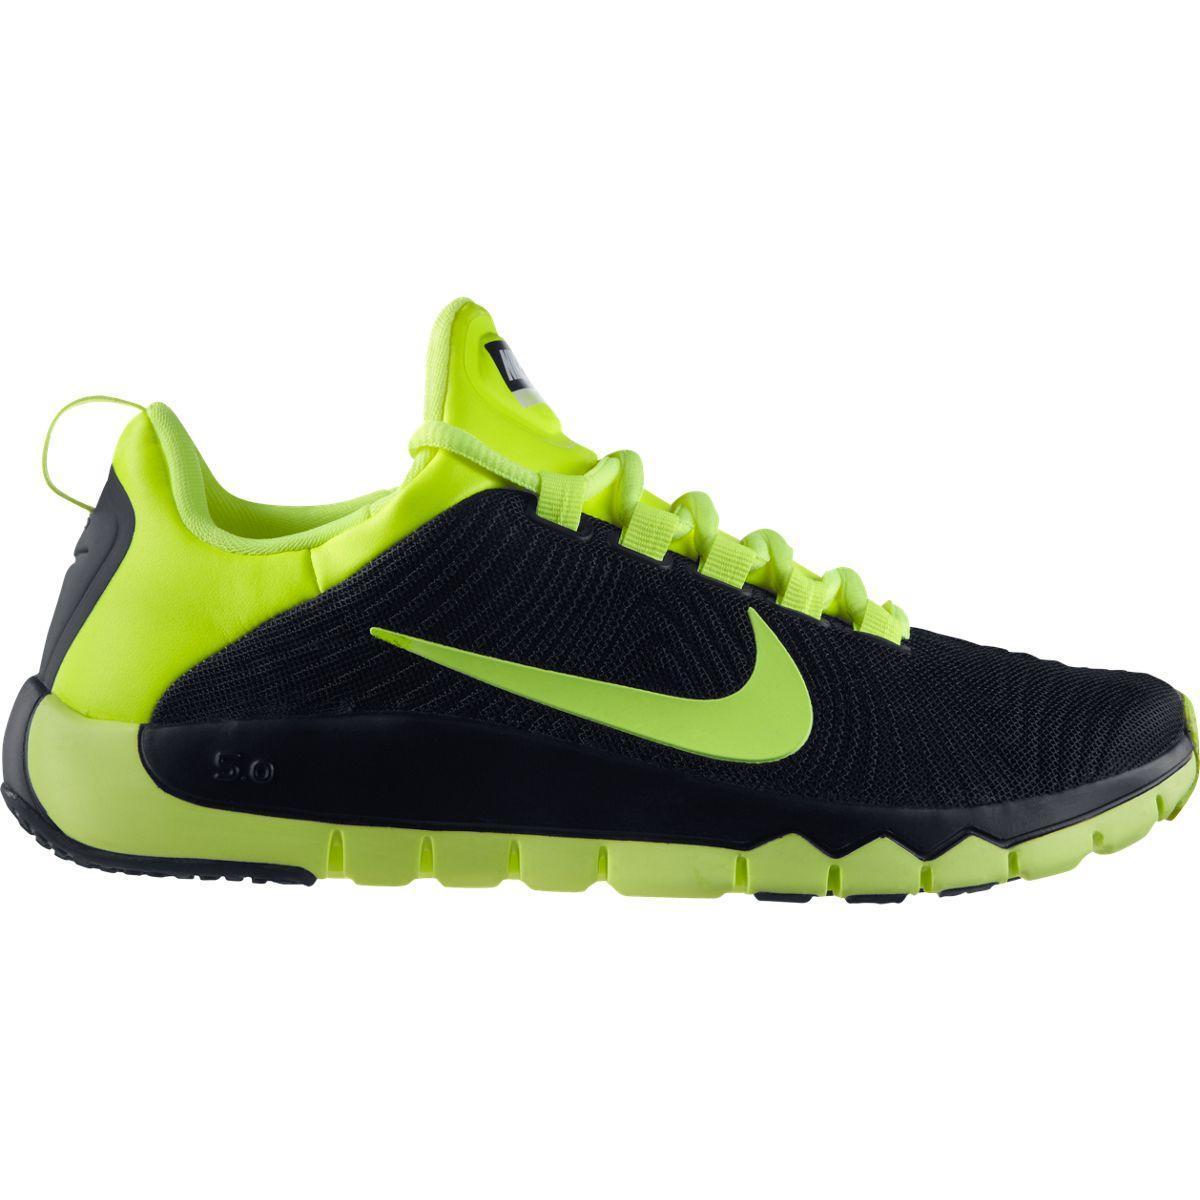 e88764e08d55 Nike Mens Free Trainer 5.0 Training Shoes - Black Volt - Tennisnuts.com